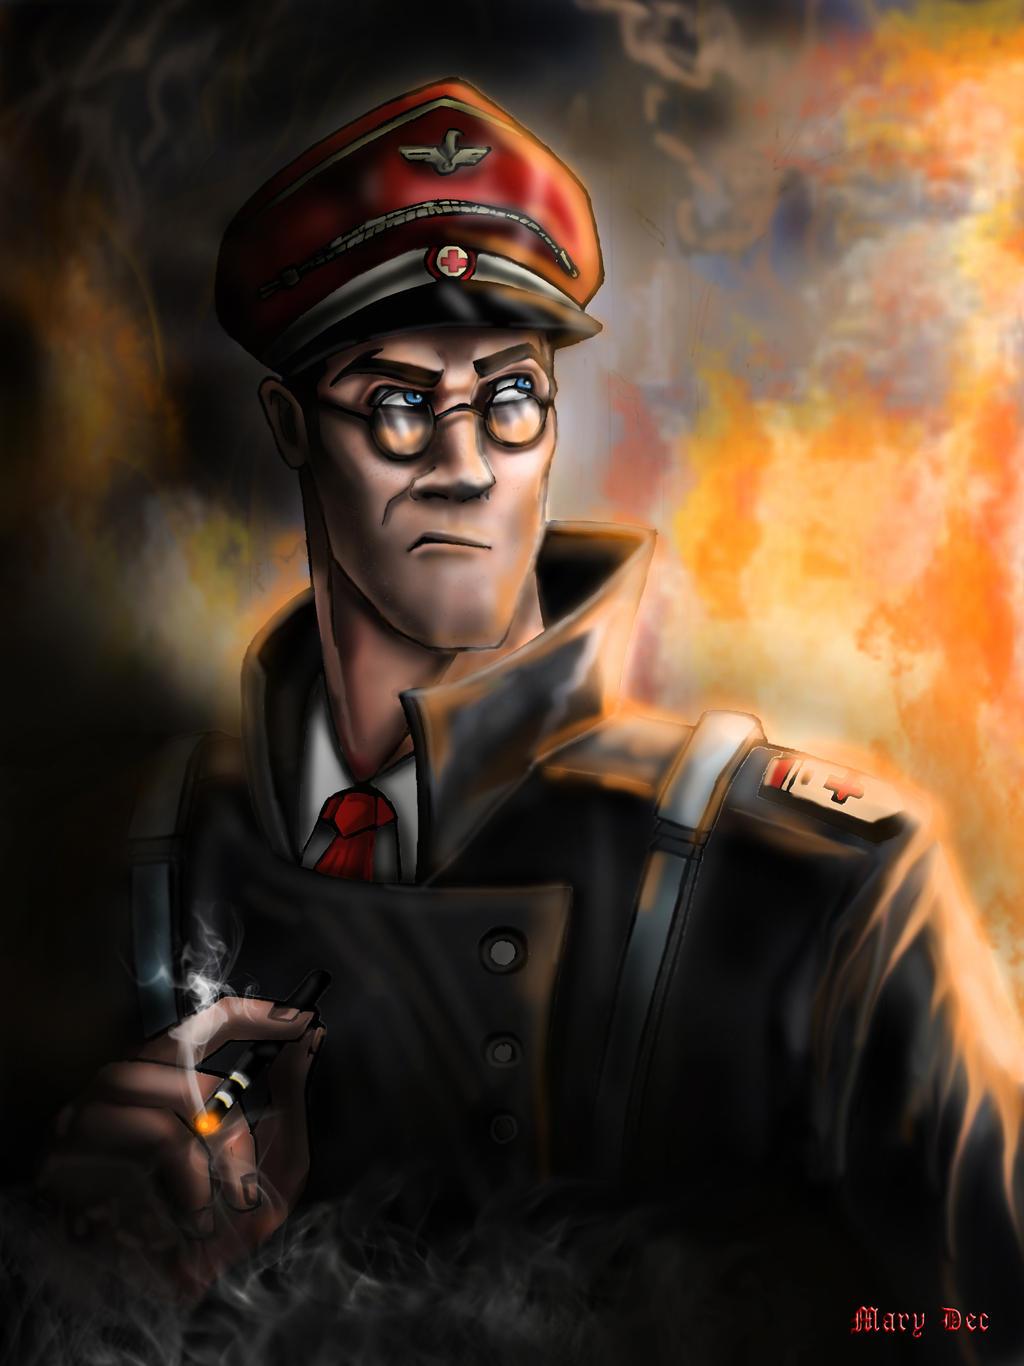 Combat Medic Ziegler by Keeterz.deviantart.com on @DeviantArt